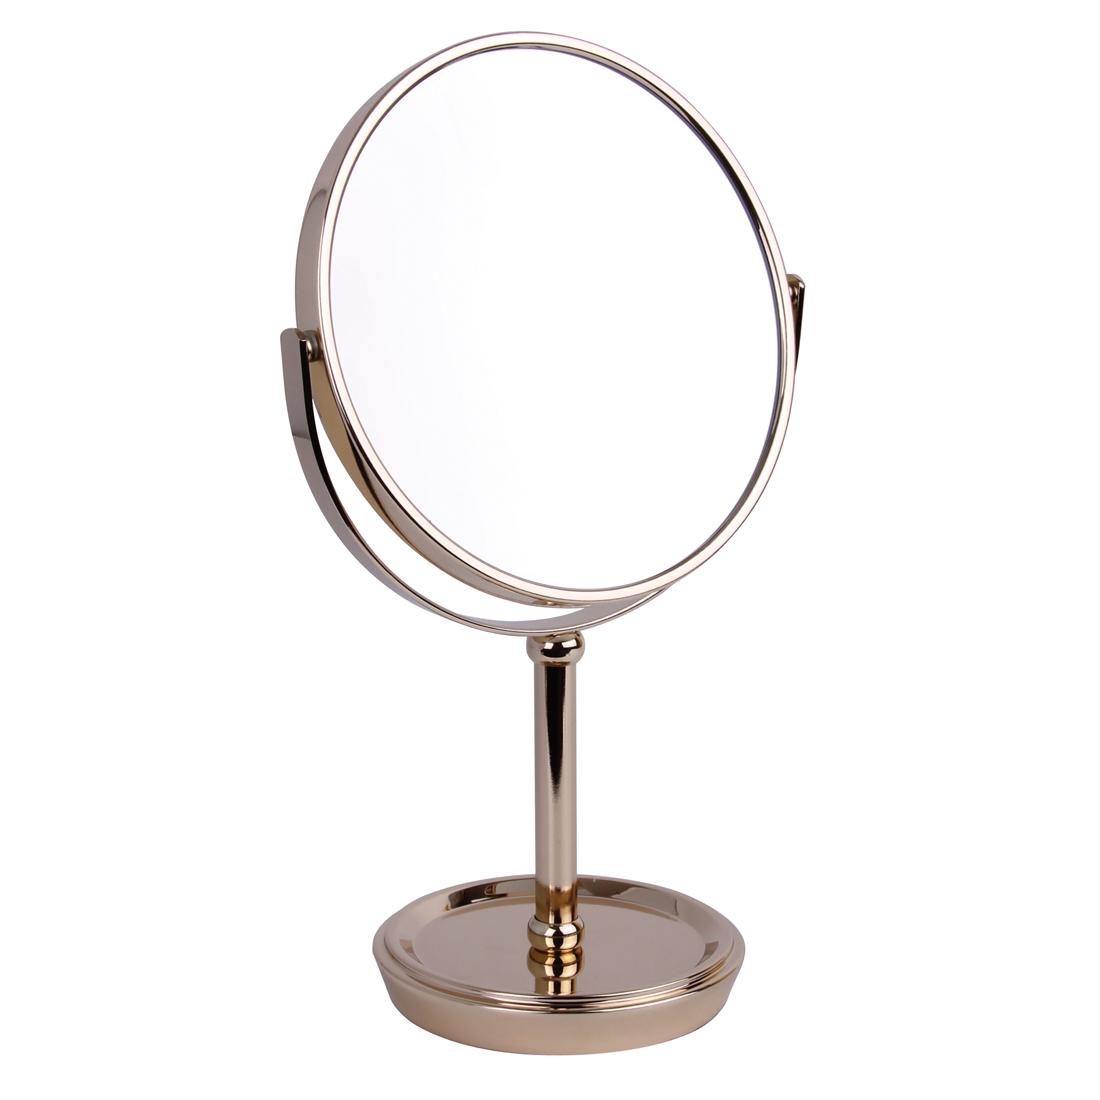 5519 17 gold - 5x Magnification Pedestal Mirror - 5519/17GOLD